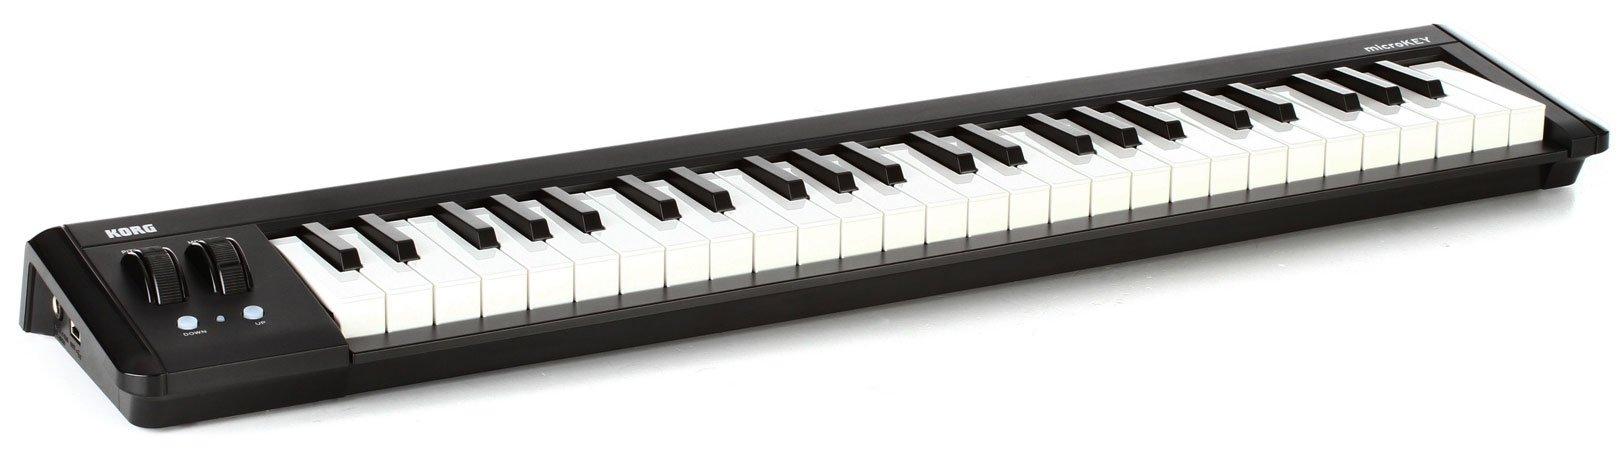 KORG microKEY2 49-Key iOS-Powerable USB MIDI Micro Keyboard Controller - Black by Korg (Image #3)